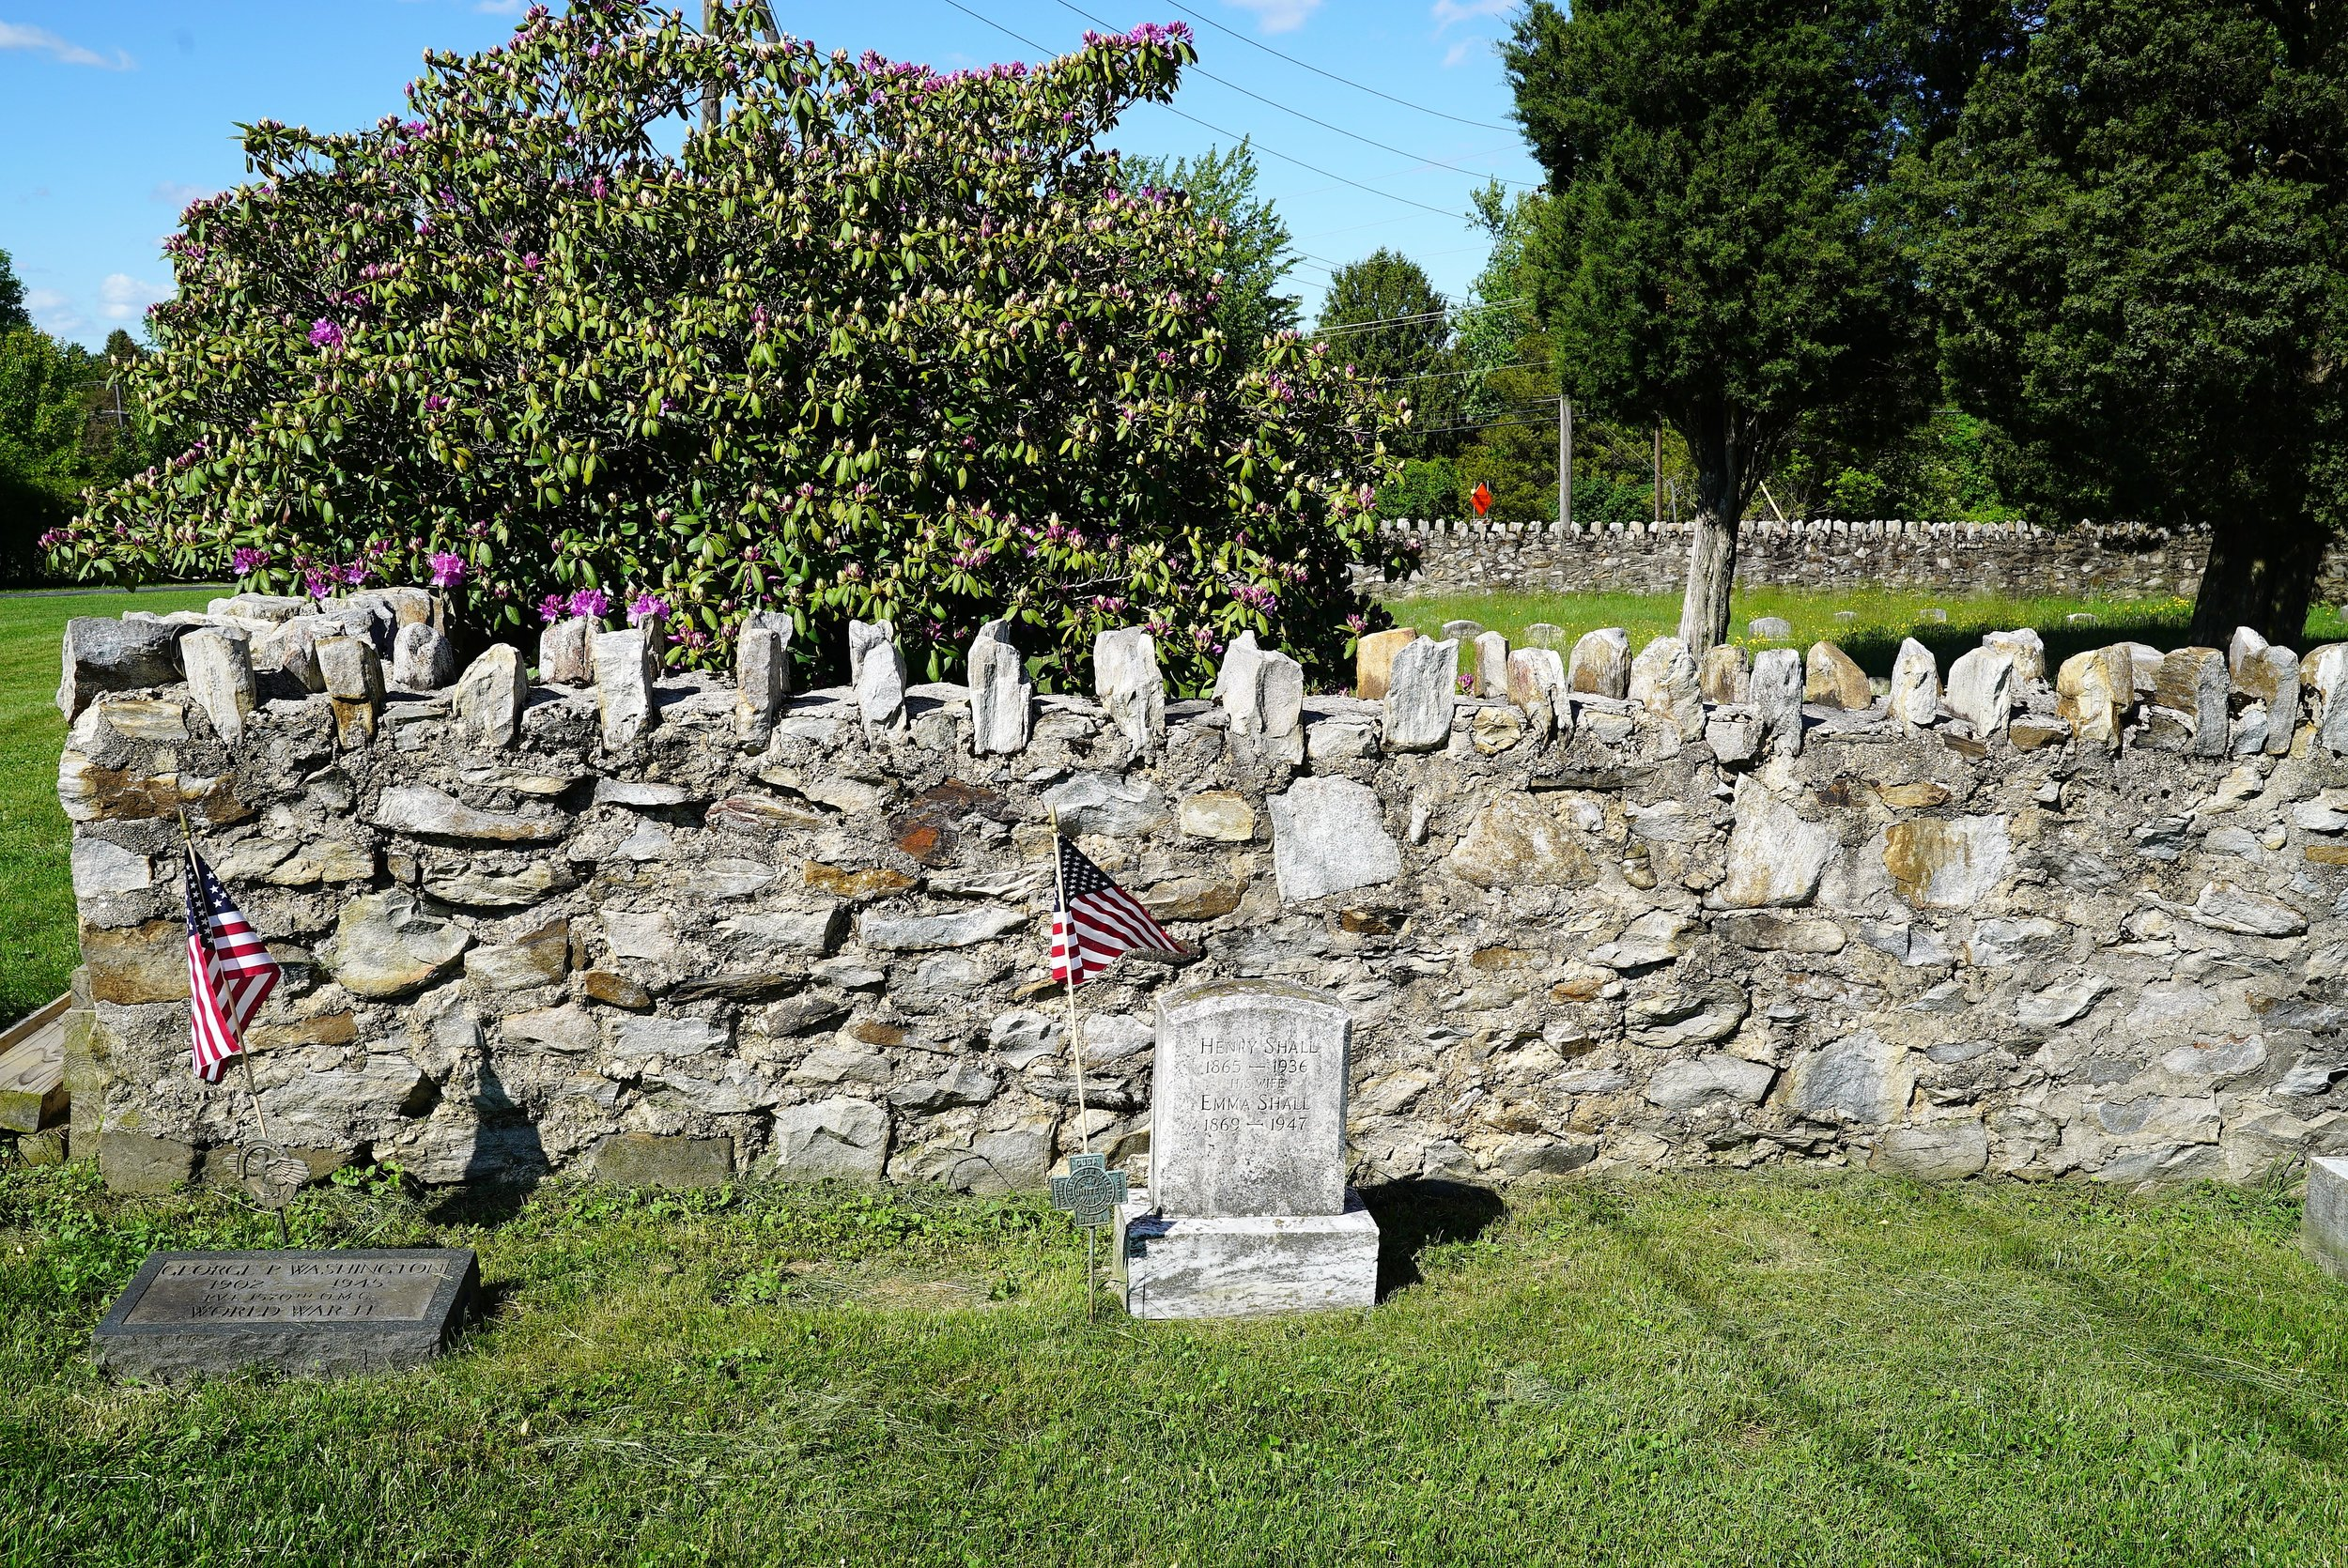 Beyond that wall is Fallowfield Orthodox Friends Burial Ground. Ercildoun, Pennsylvania.